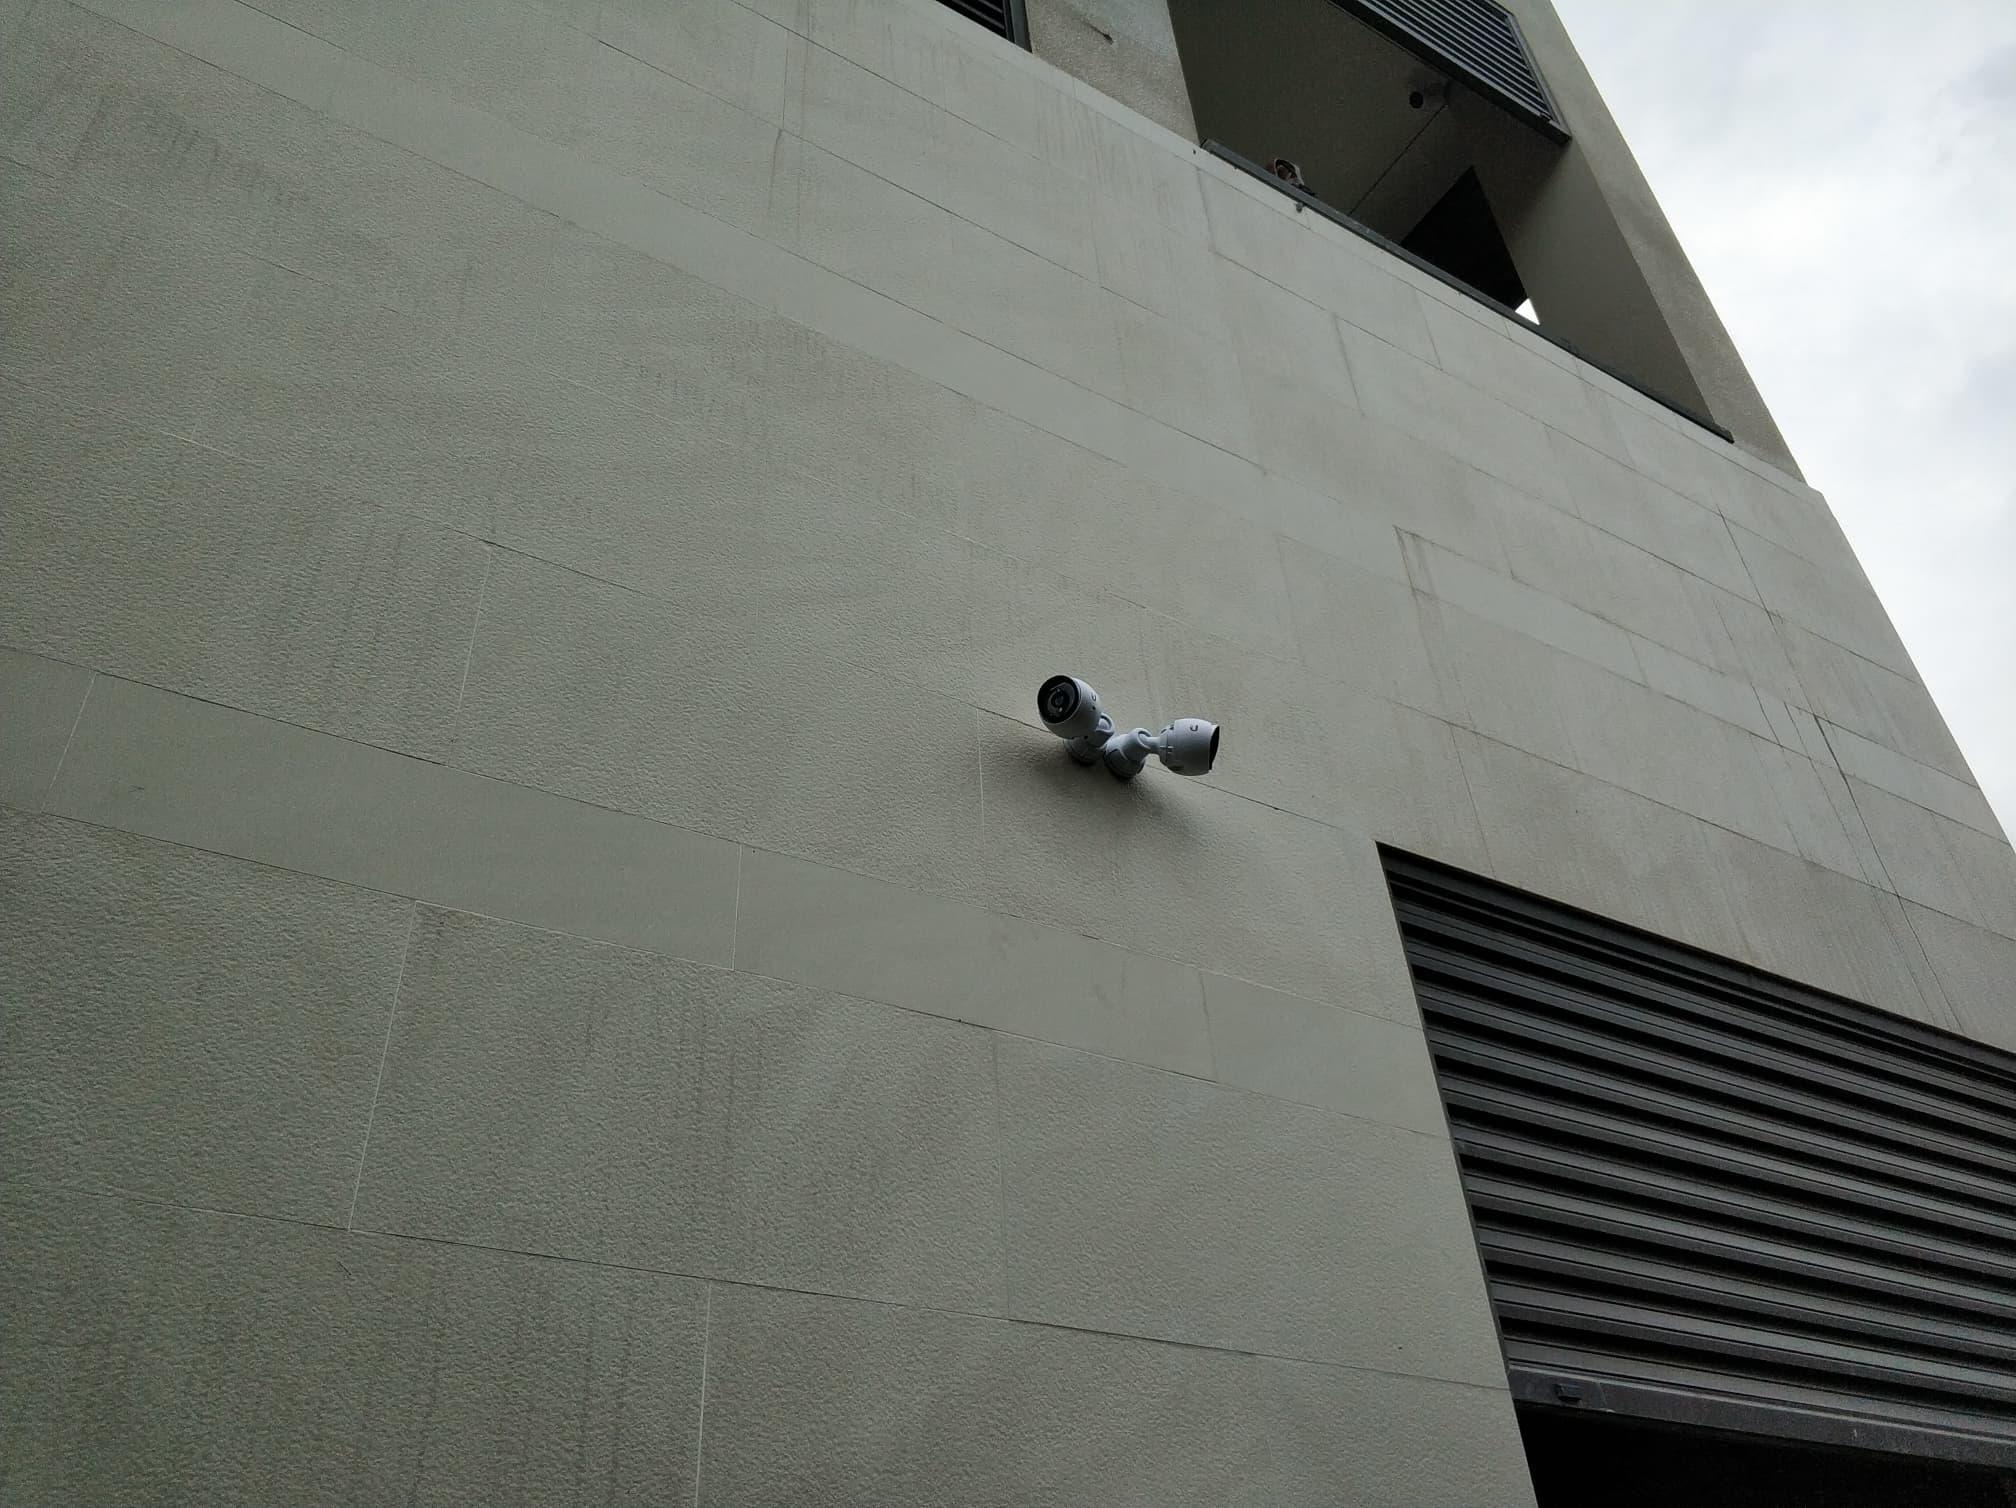 Outdoor mounted Ubiquiti CCTV Cameras (pair)